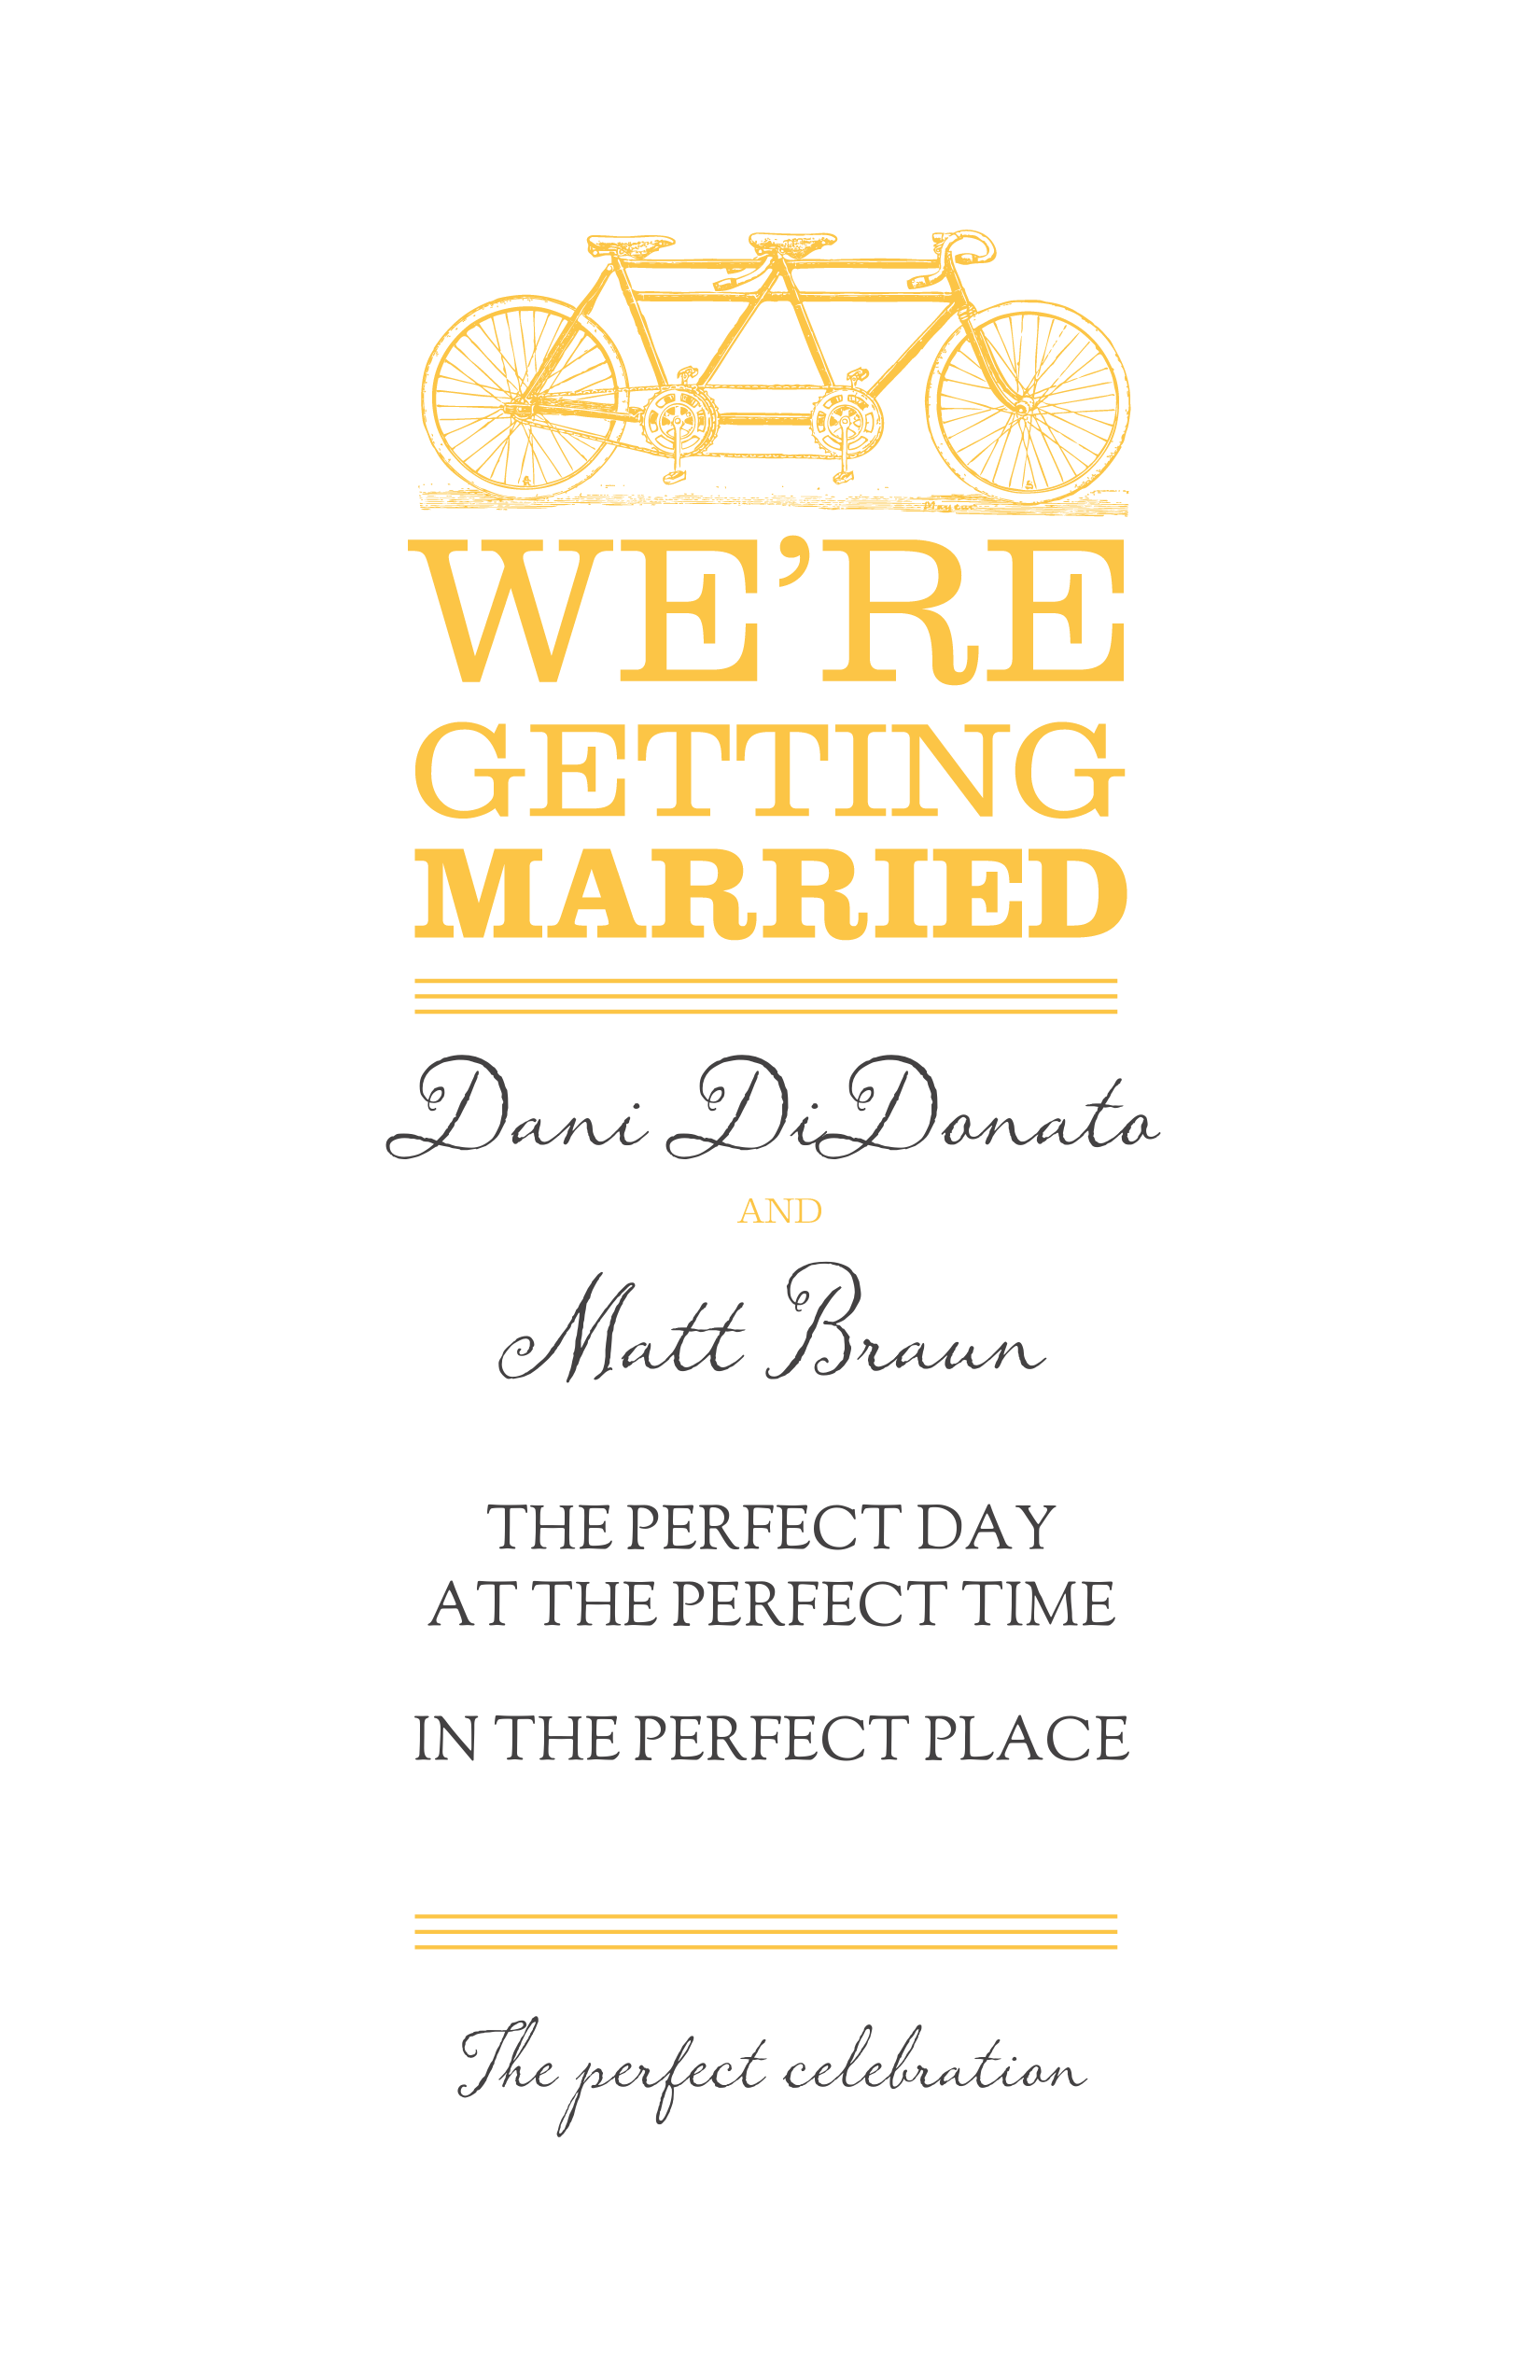 Retro Wedding Free Printable Invitation Templates   Pinterest ...